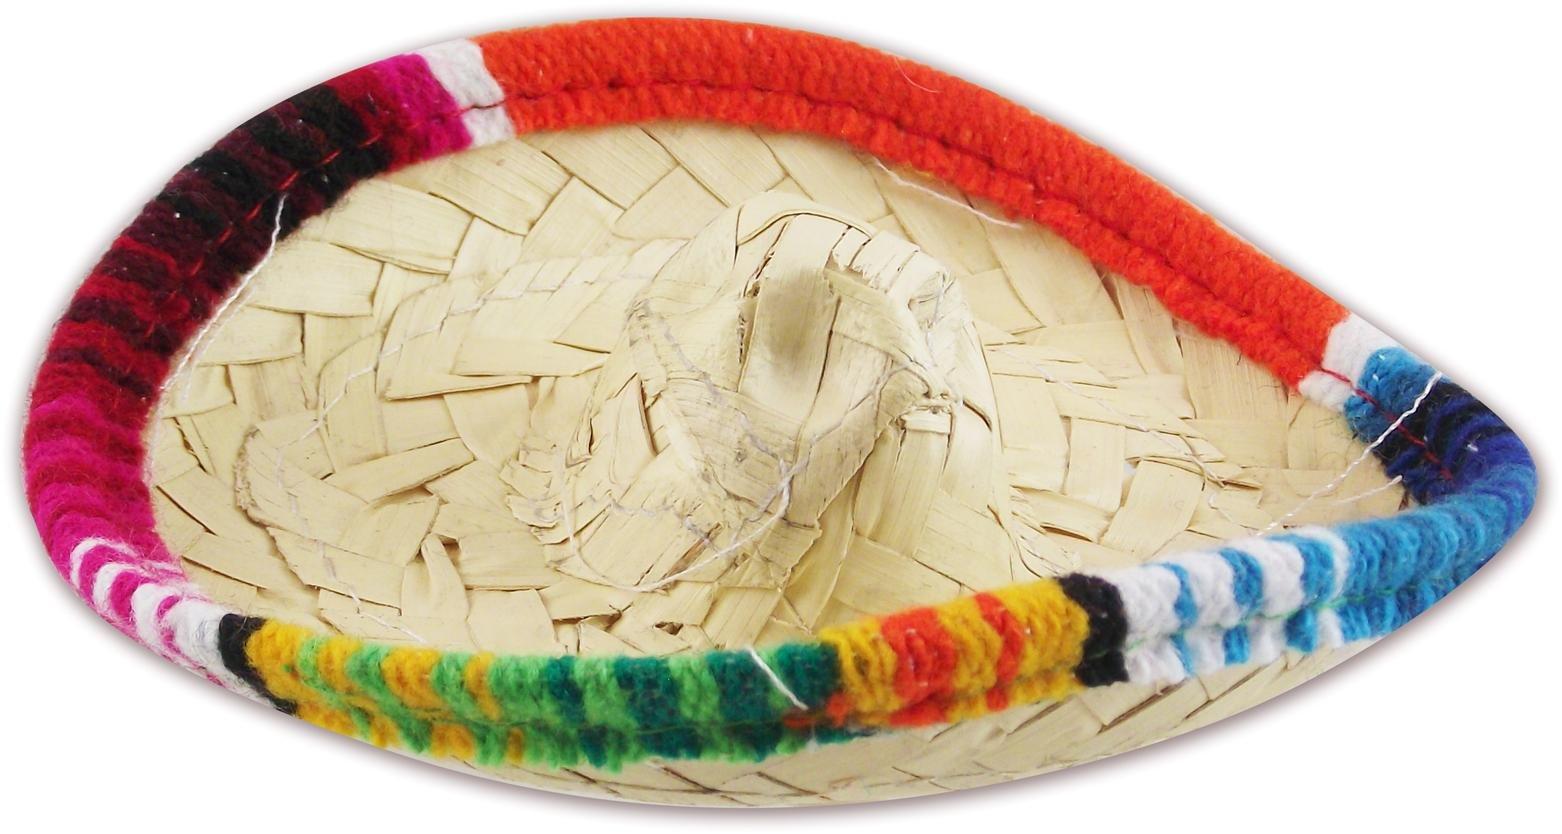 Mini Fiesta Sombrero - 5'' Hair-Clip Hat, 6-Pack by MoreFiesta